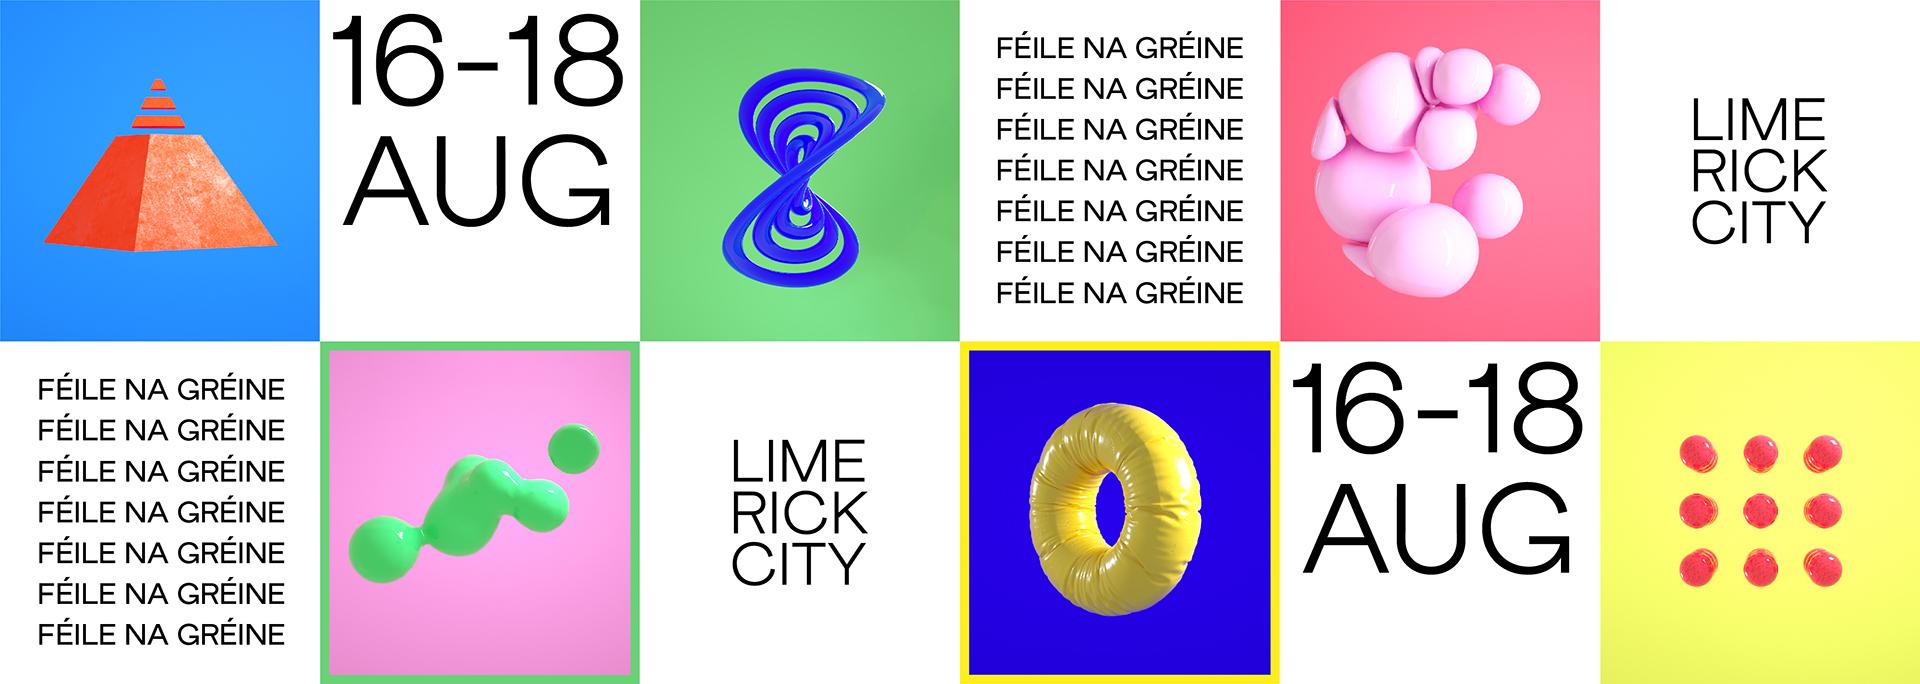 Feile na Greine Limerick City Music Trail Piquant Media Graphic Design